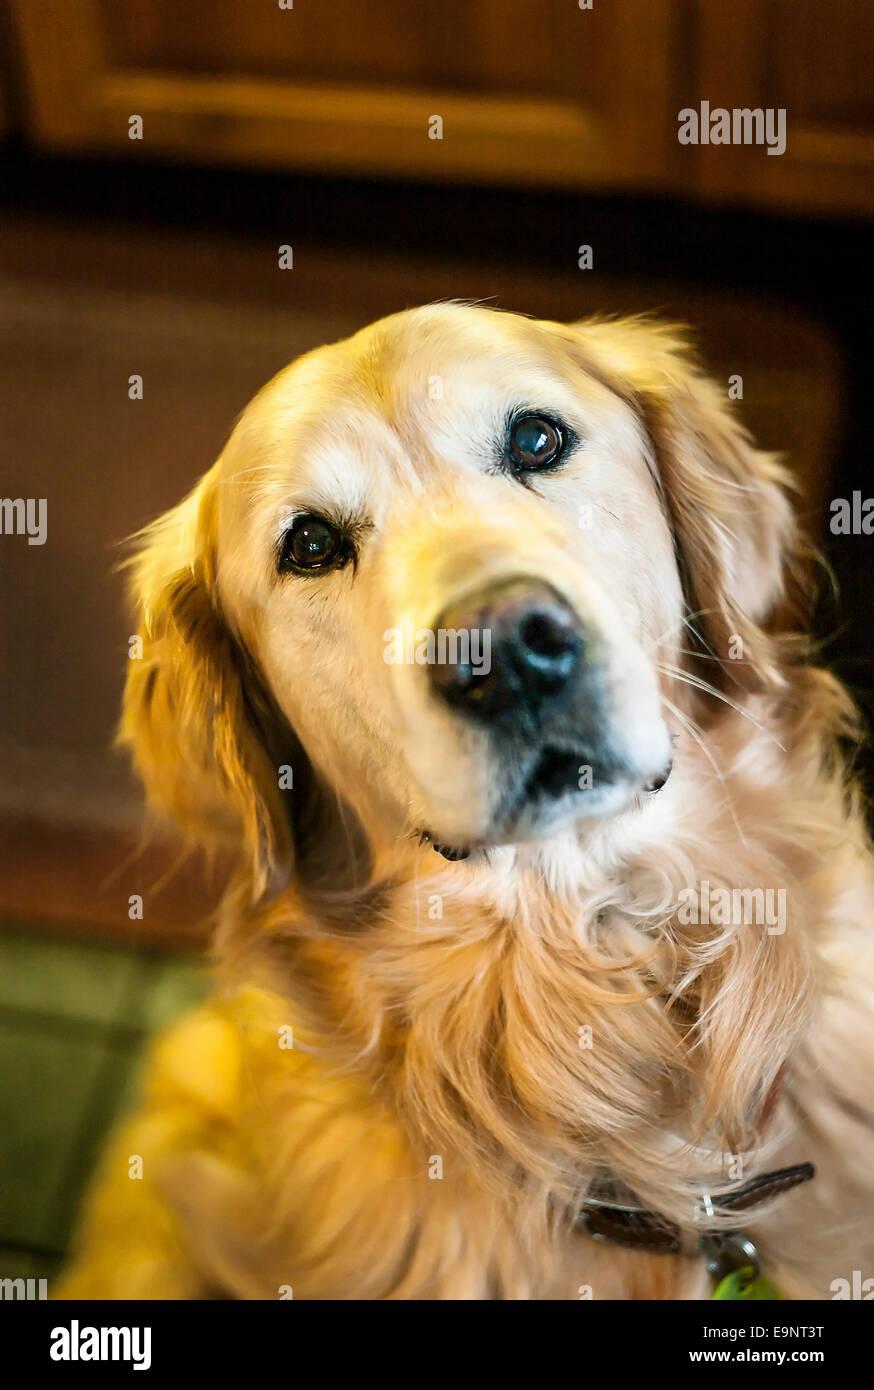 Attentive golden retriever dog - Stock Image